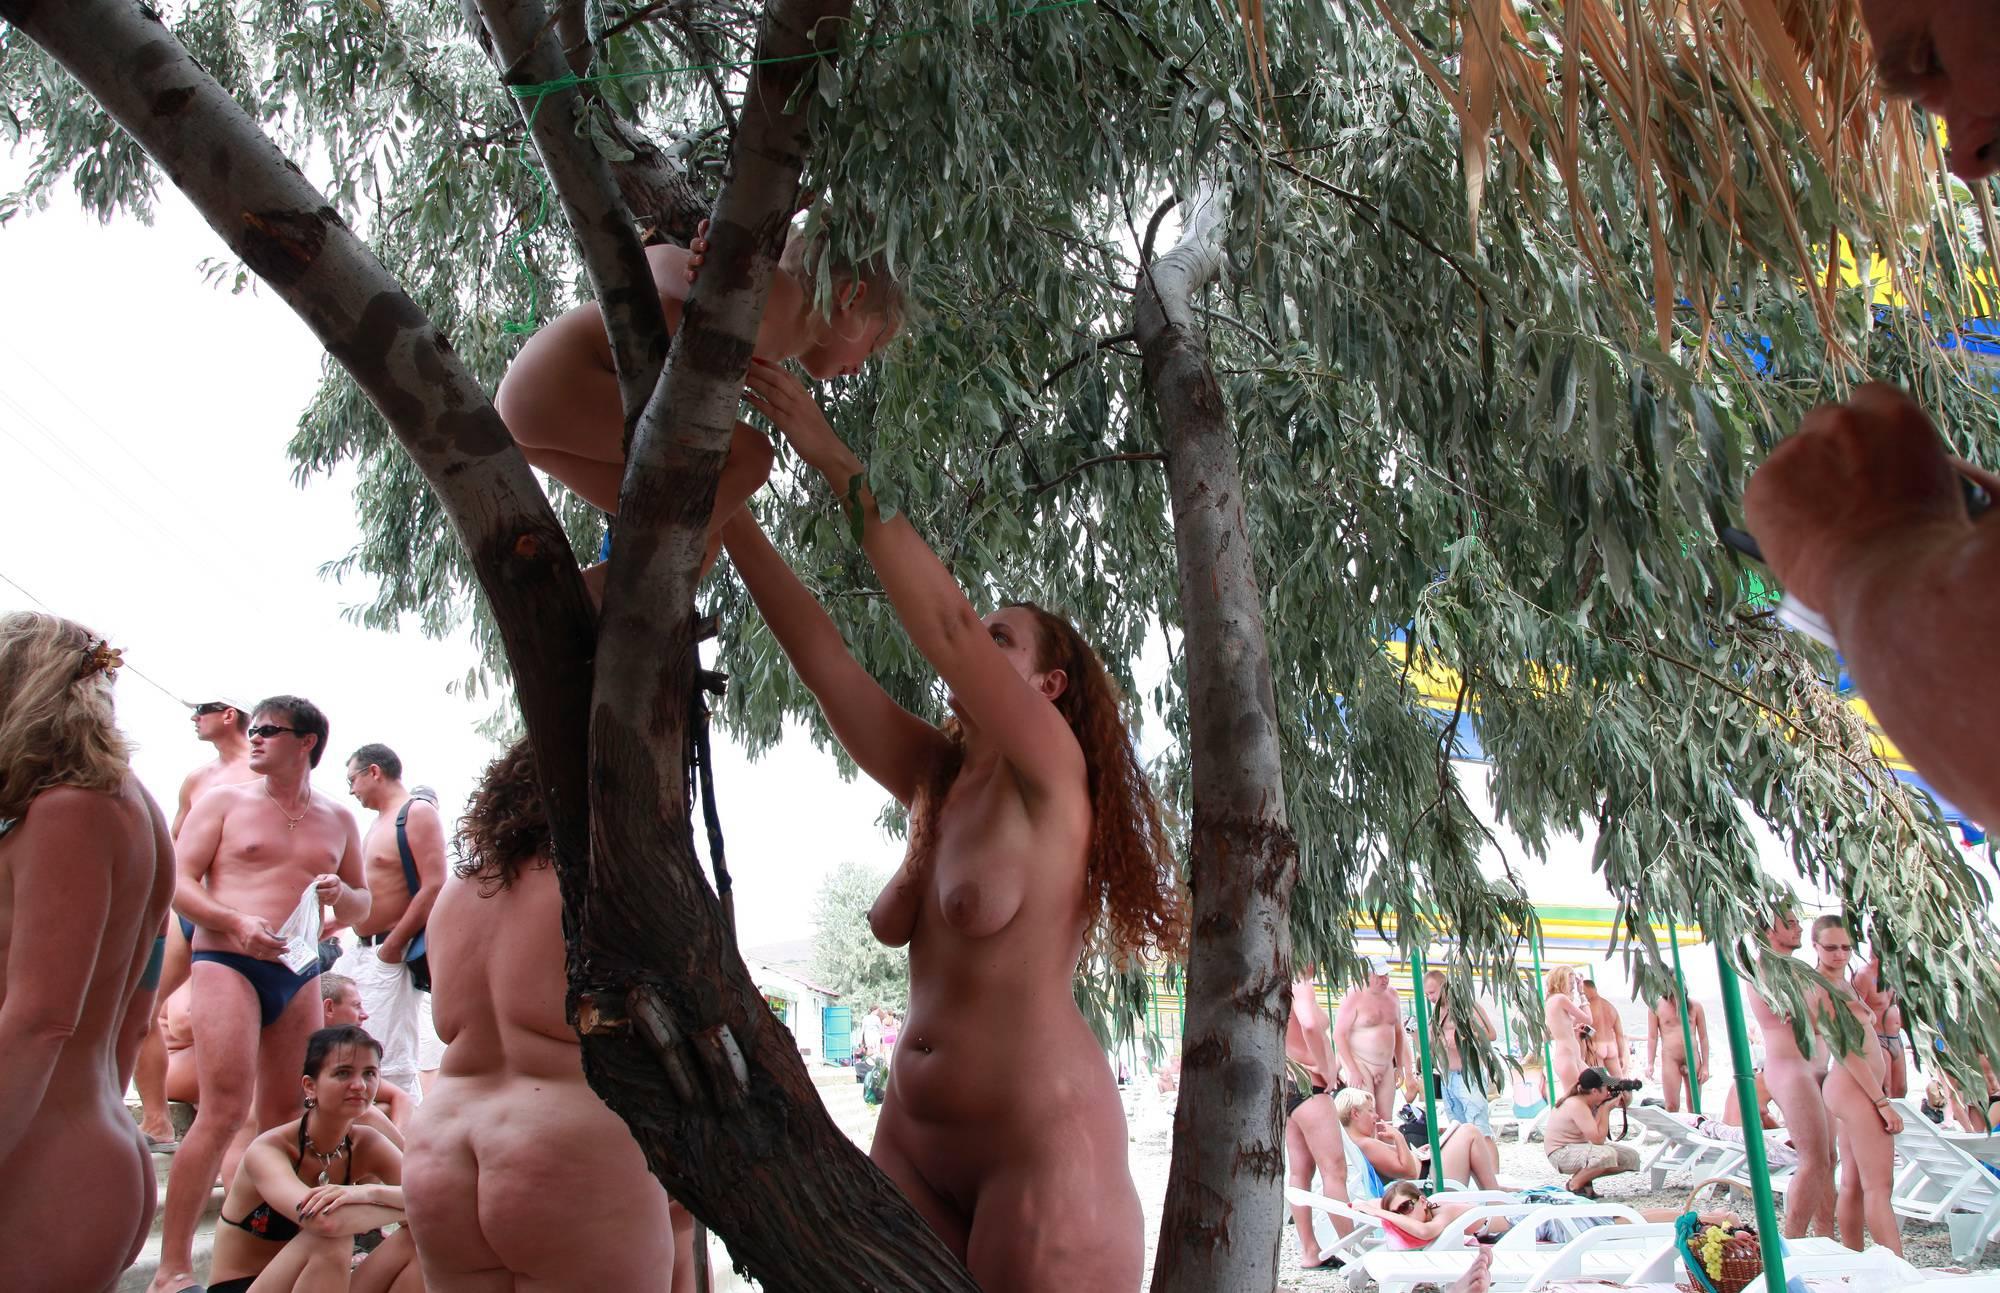 Neptune Her Tree Climbs - 2